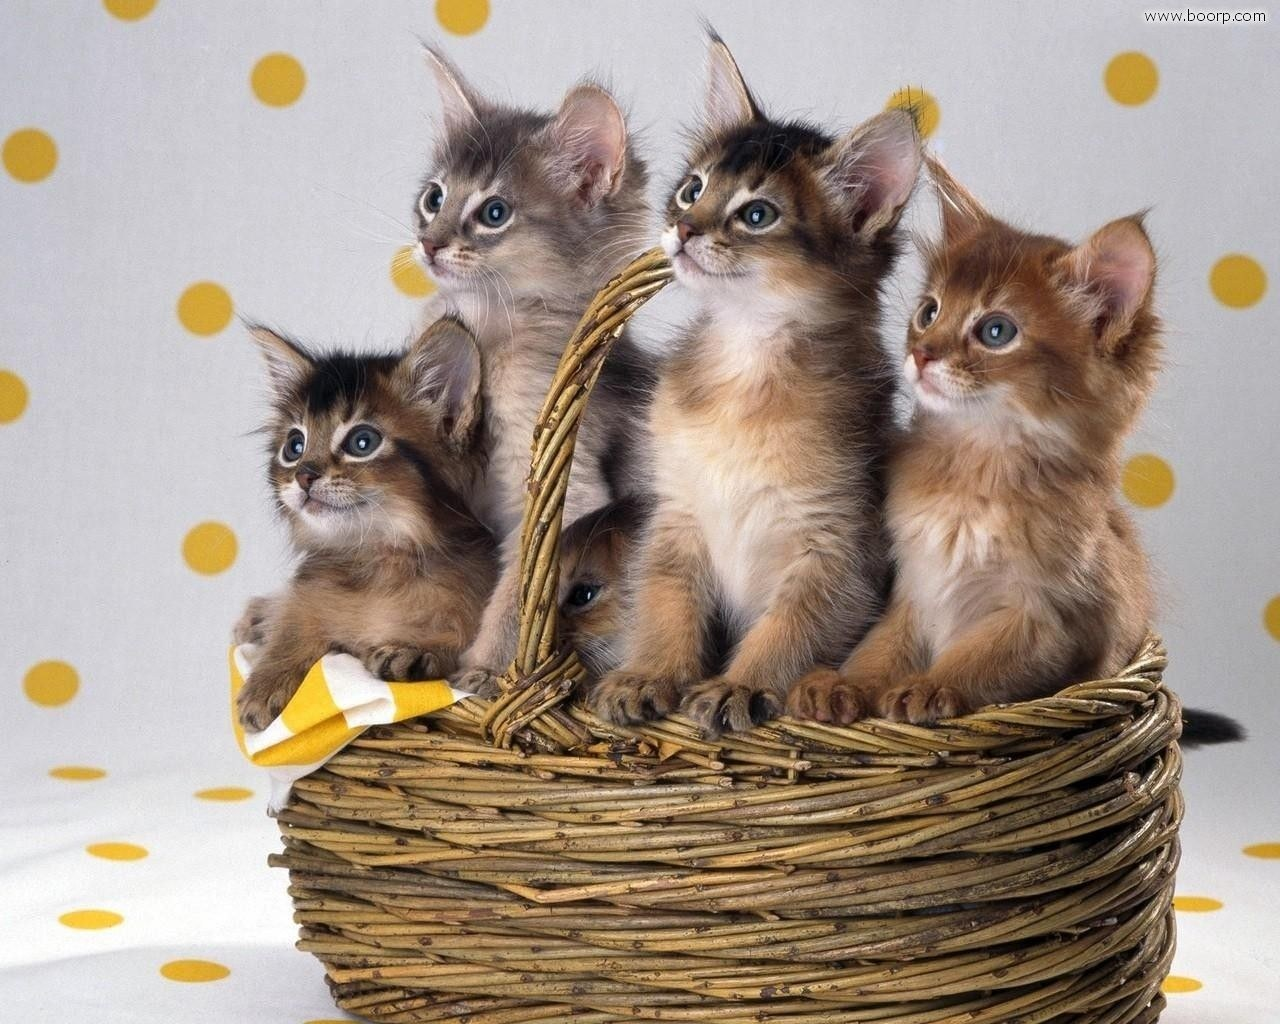 Sfondi desktop animali for Gatti sfondi desktop gratis